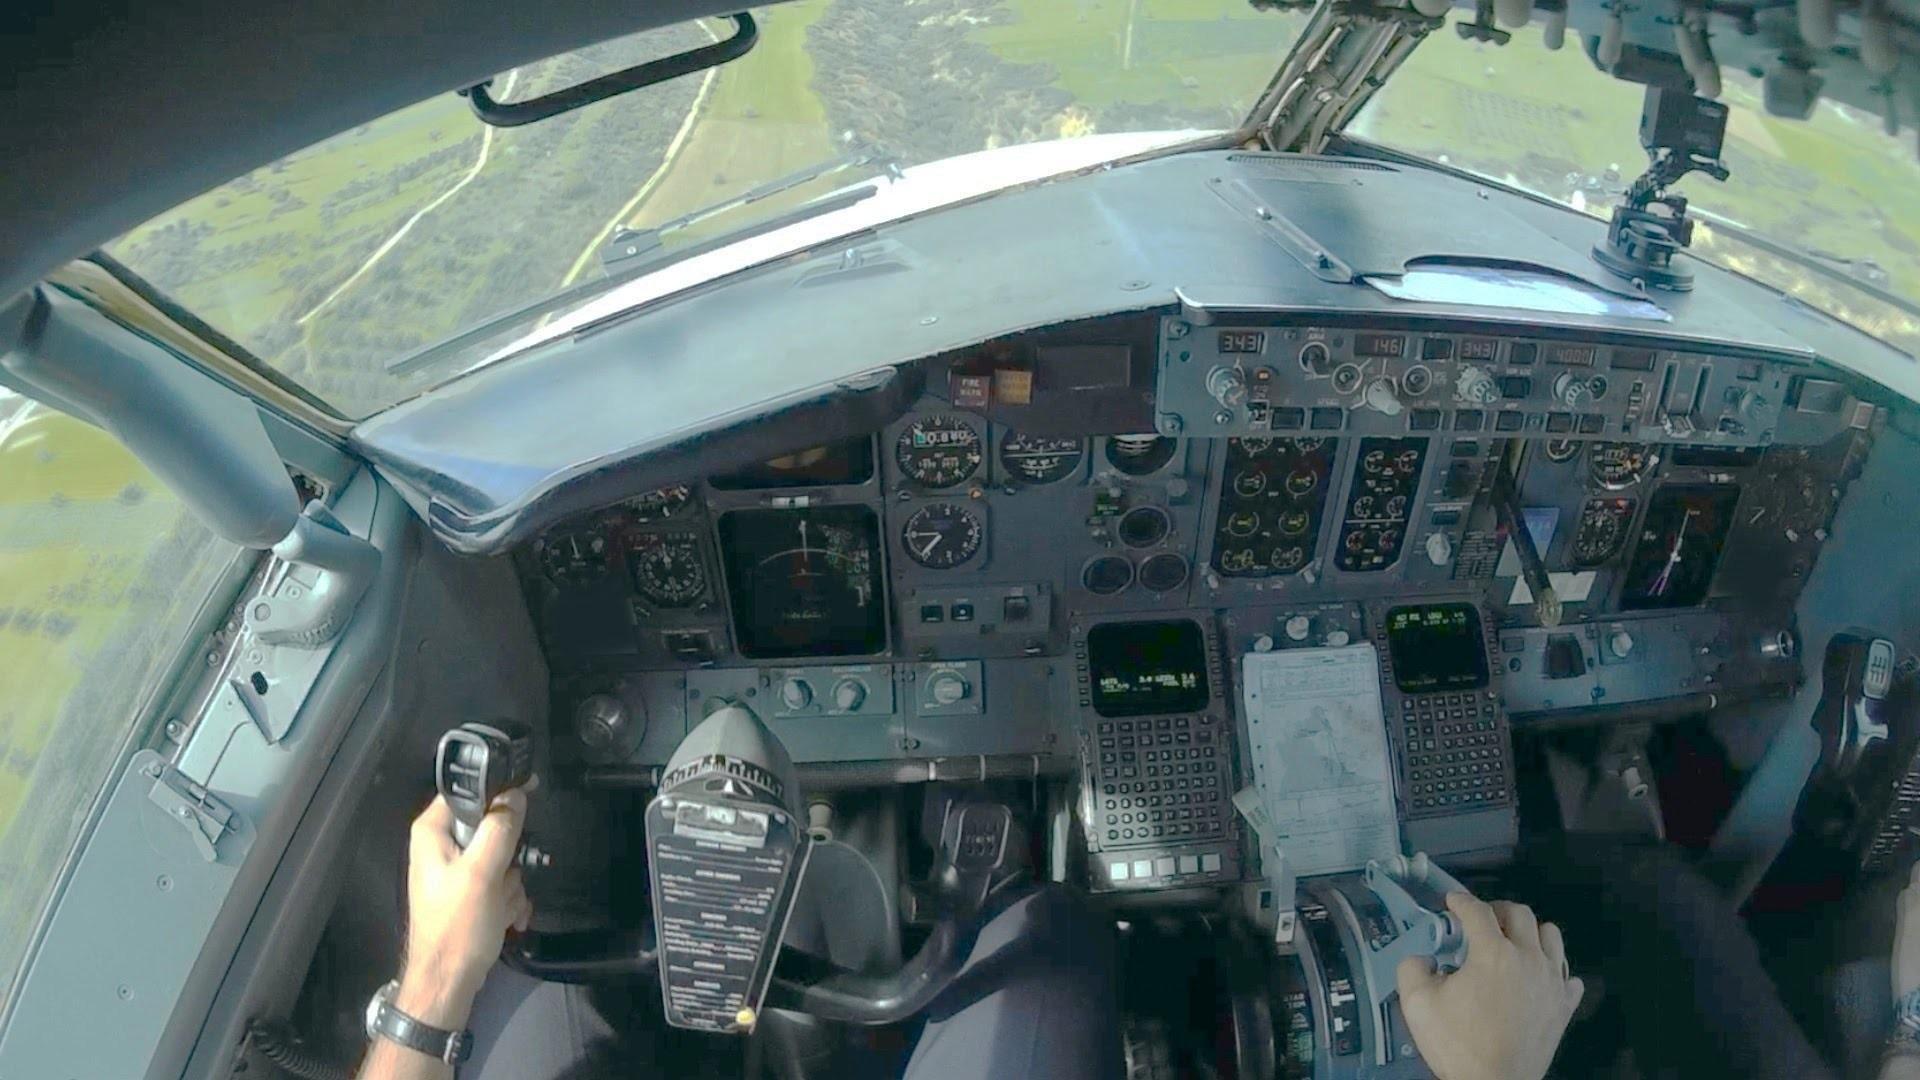 Boeing 737-400 Cockpit Flight LCLK-LGTS | Cockpit Takeoff and Landing |  GoPro Full Flight – YouTube